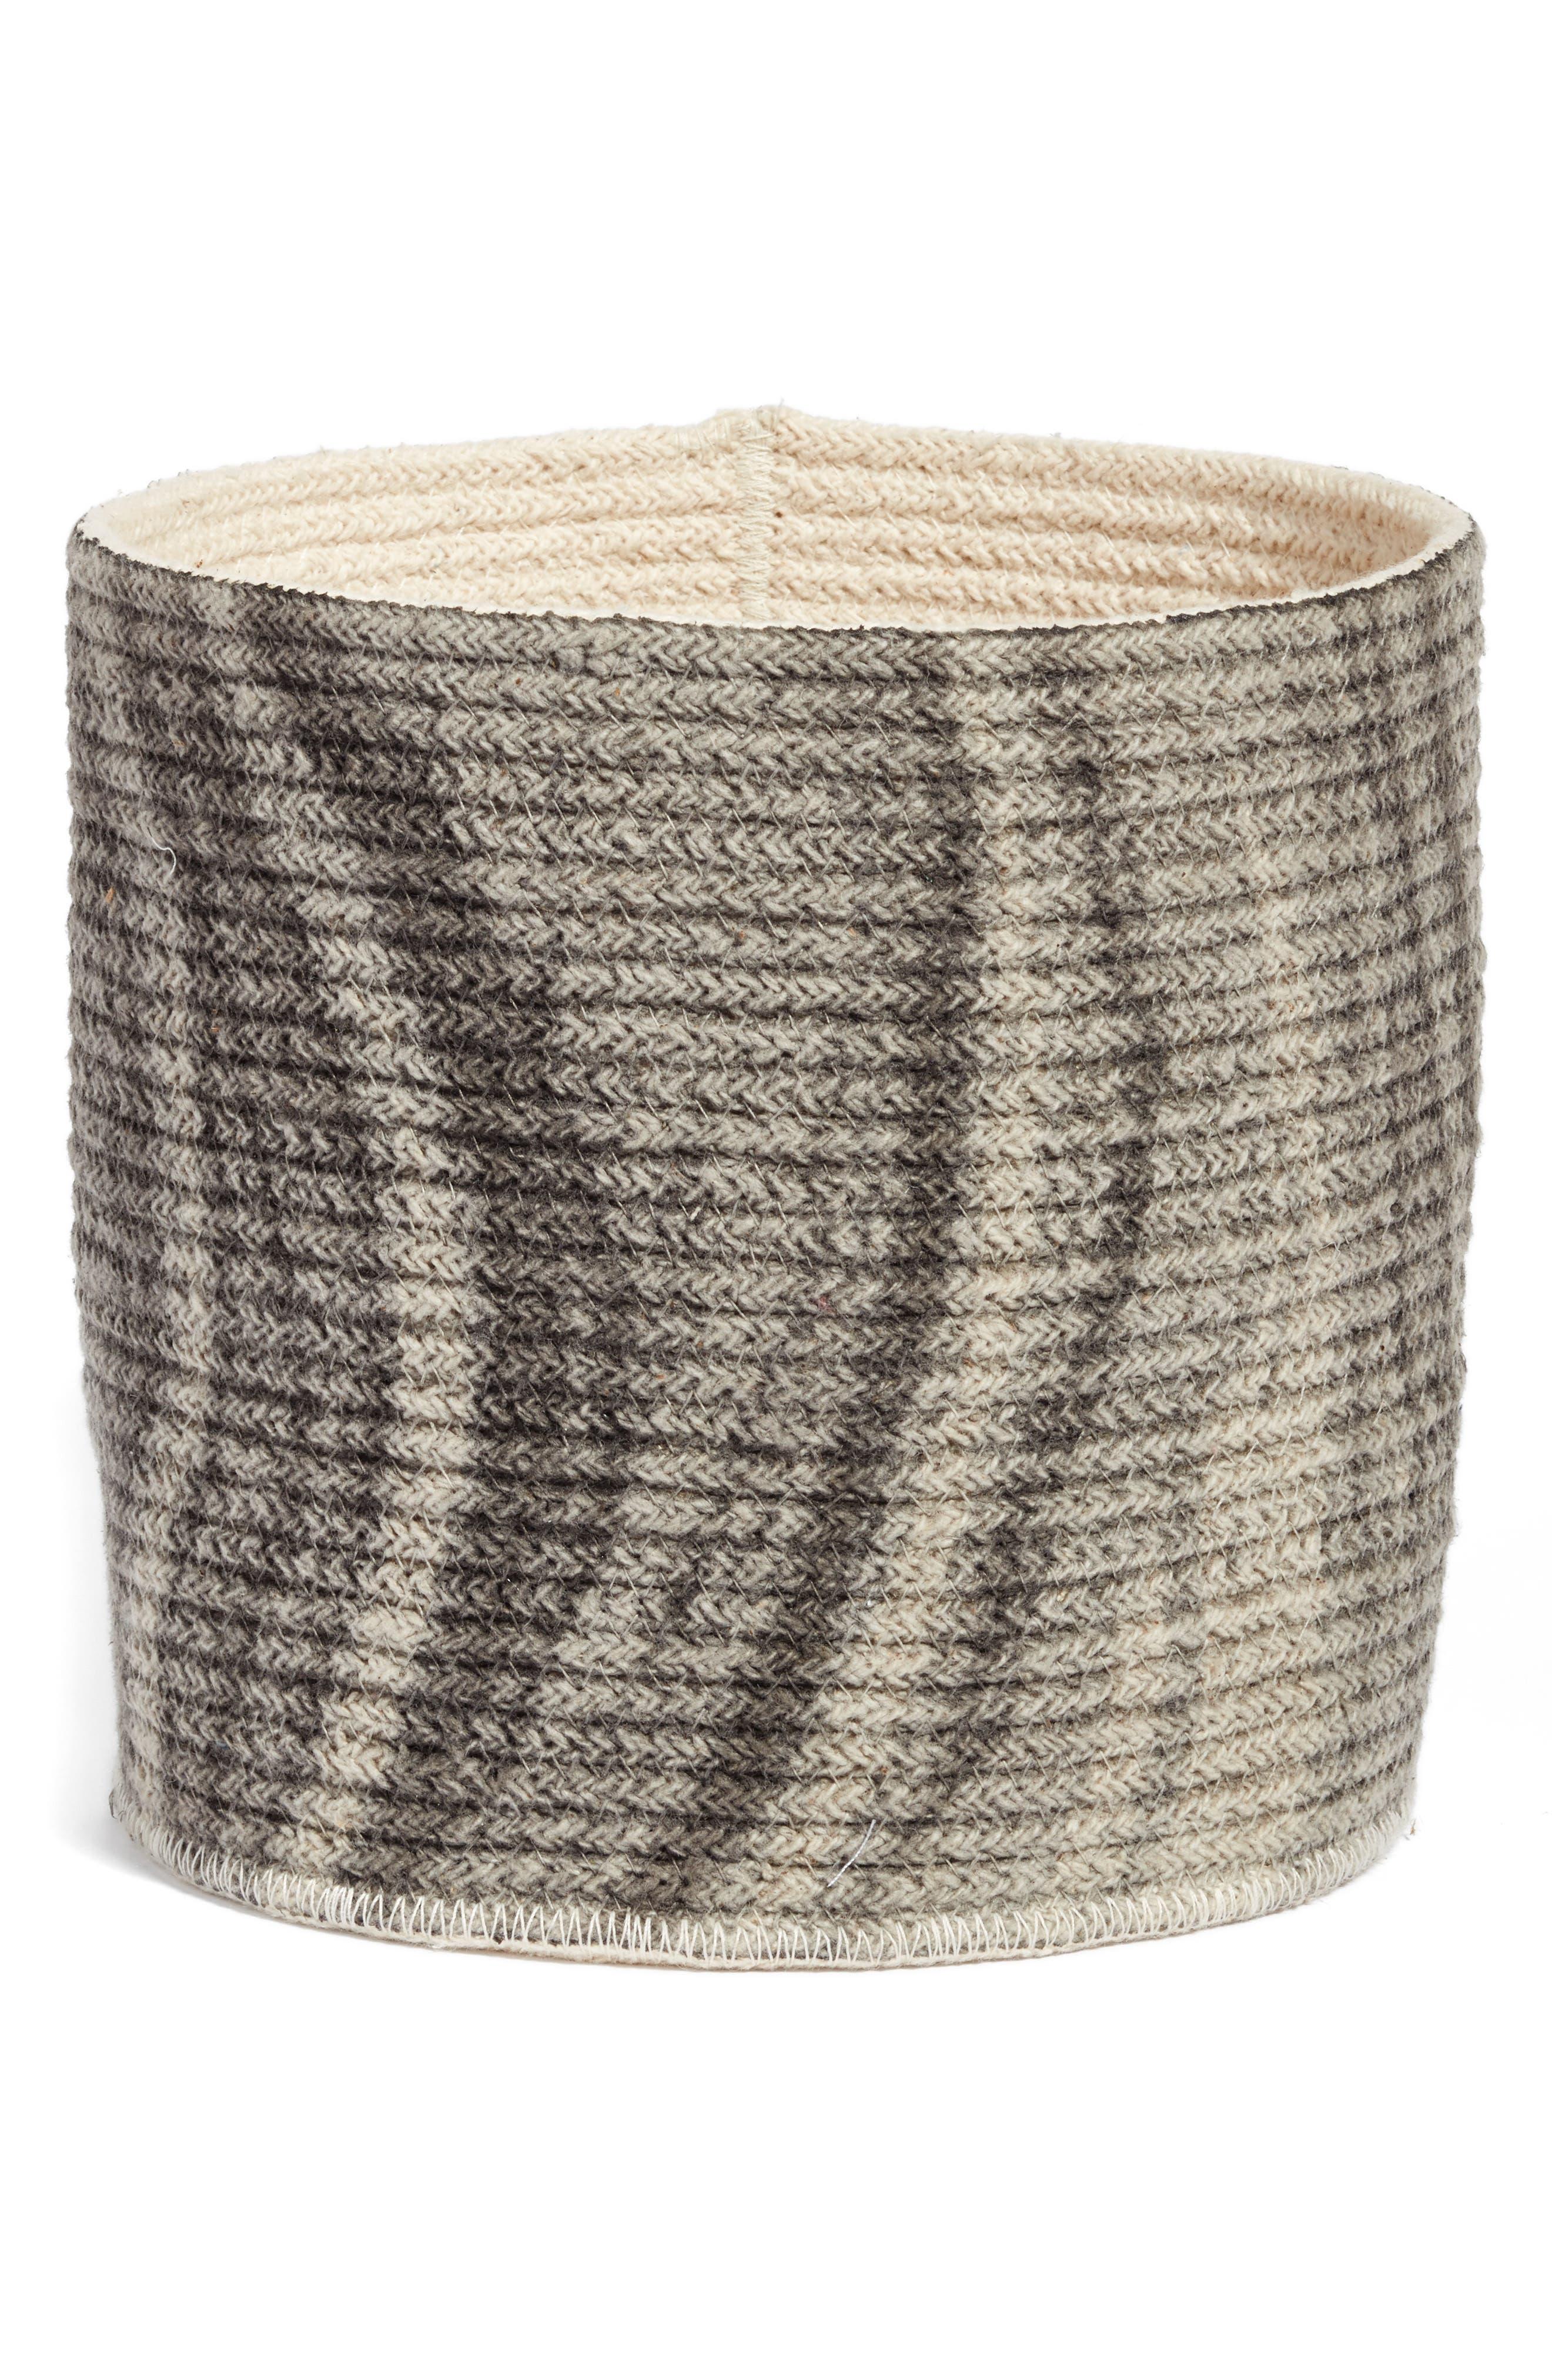 Oceana Woven Basket,                         Main,                         color, 020